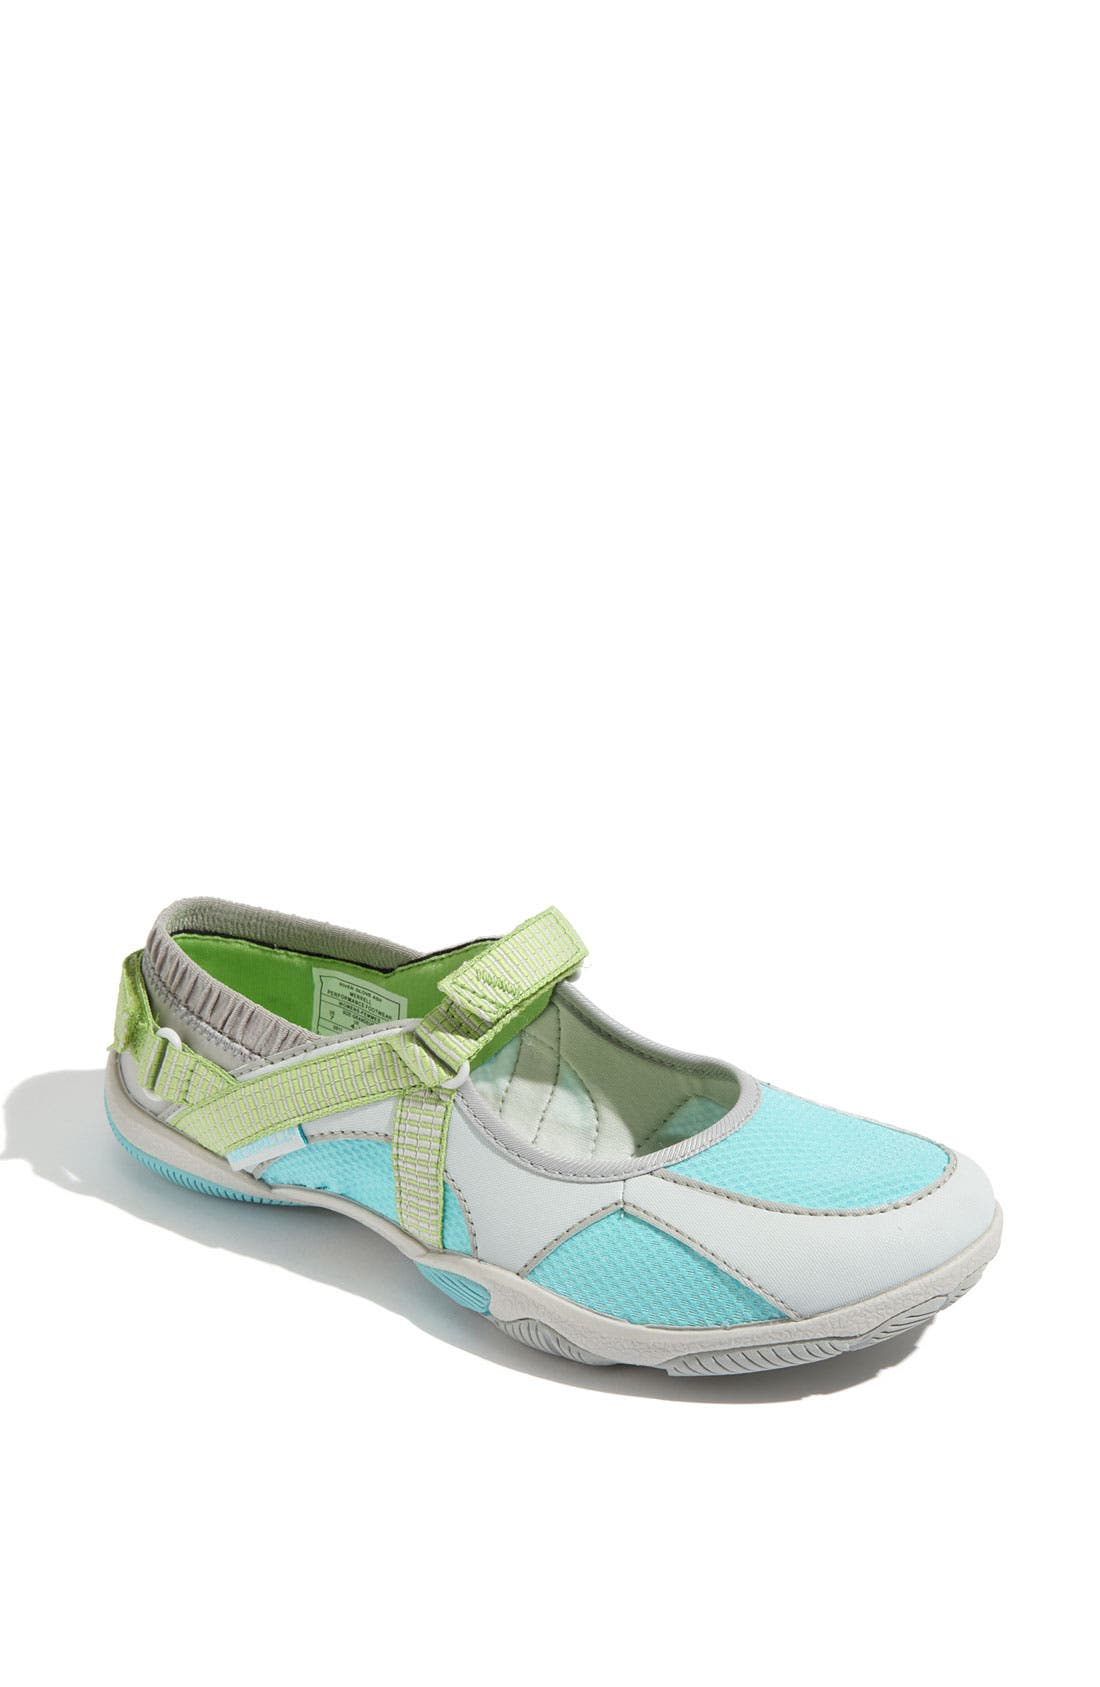 Main Image - Merrell 'River Glove' Sneaker (Women)